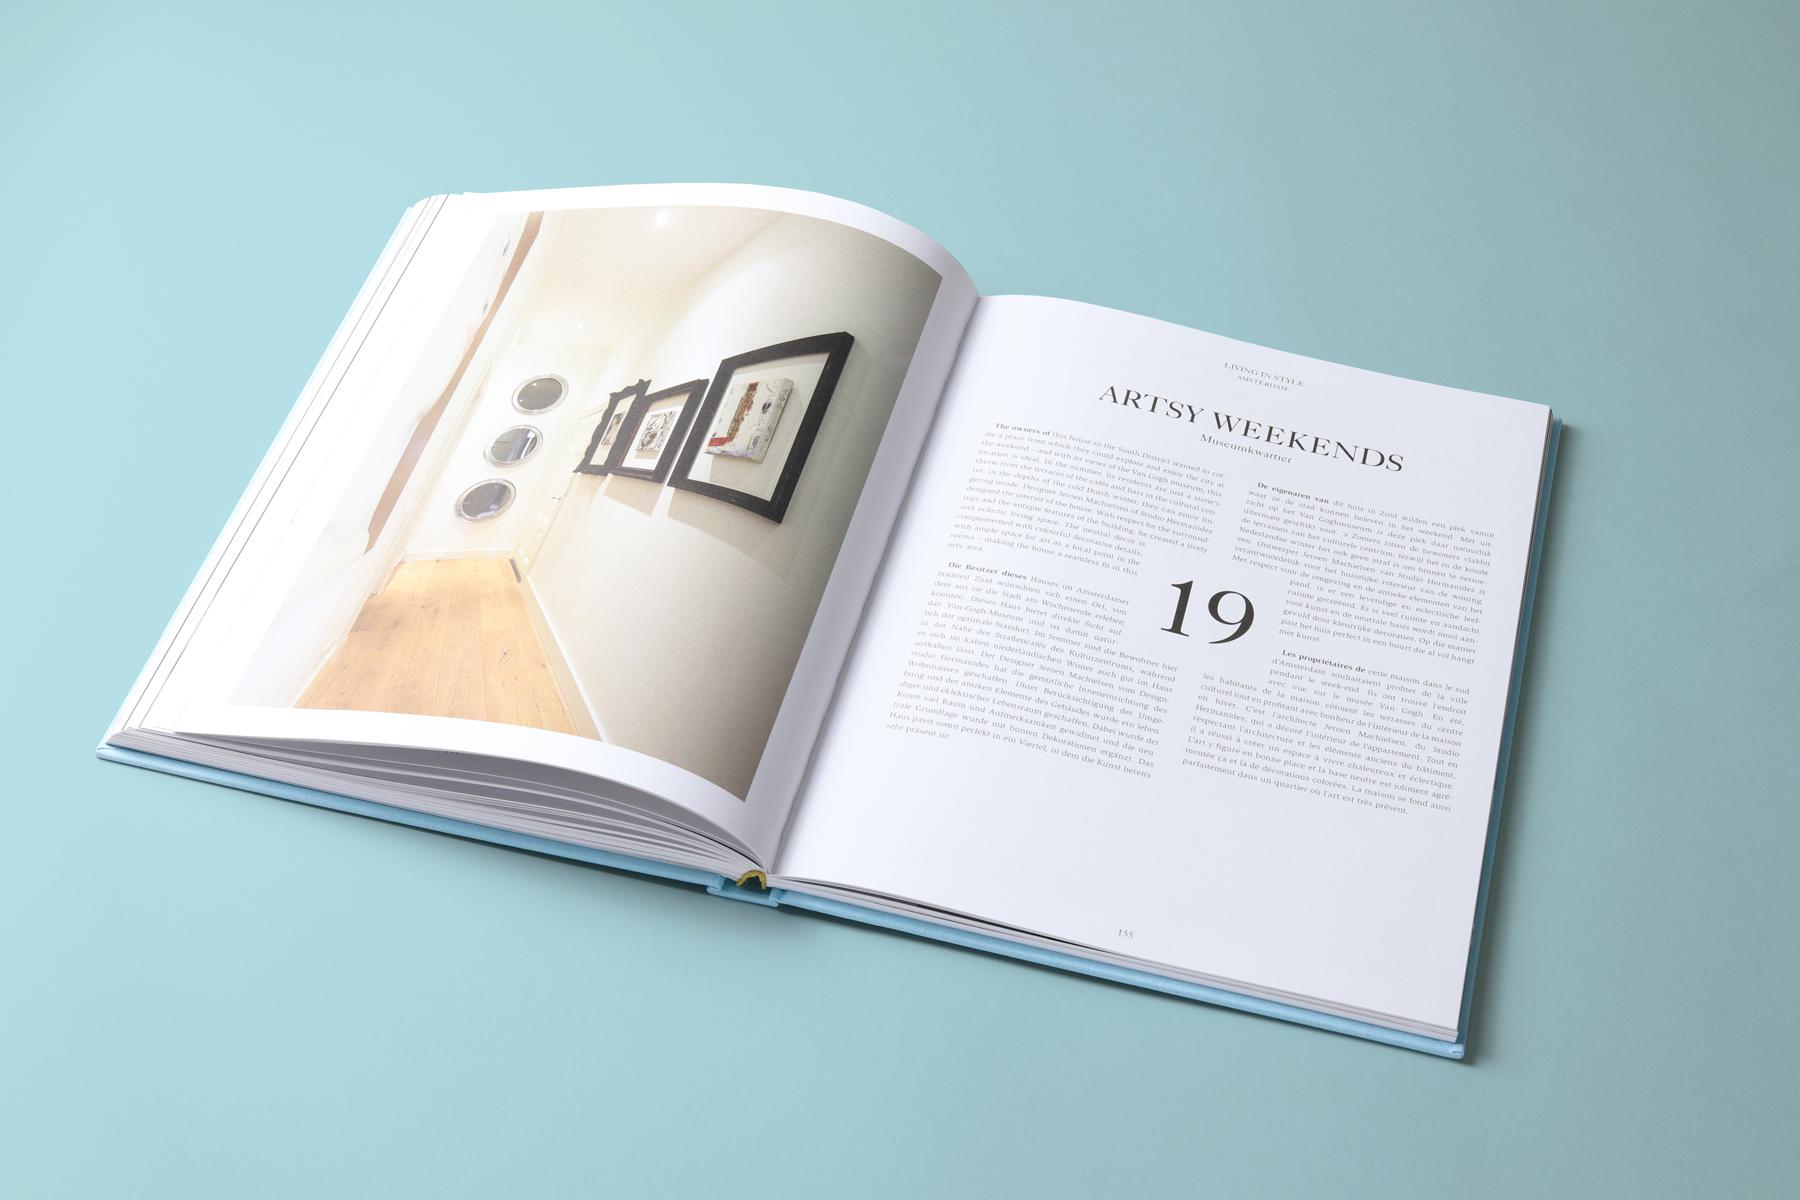 living-in-style-book-studio-hermanides-page-154.jpg